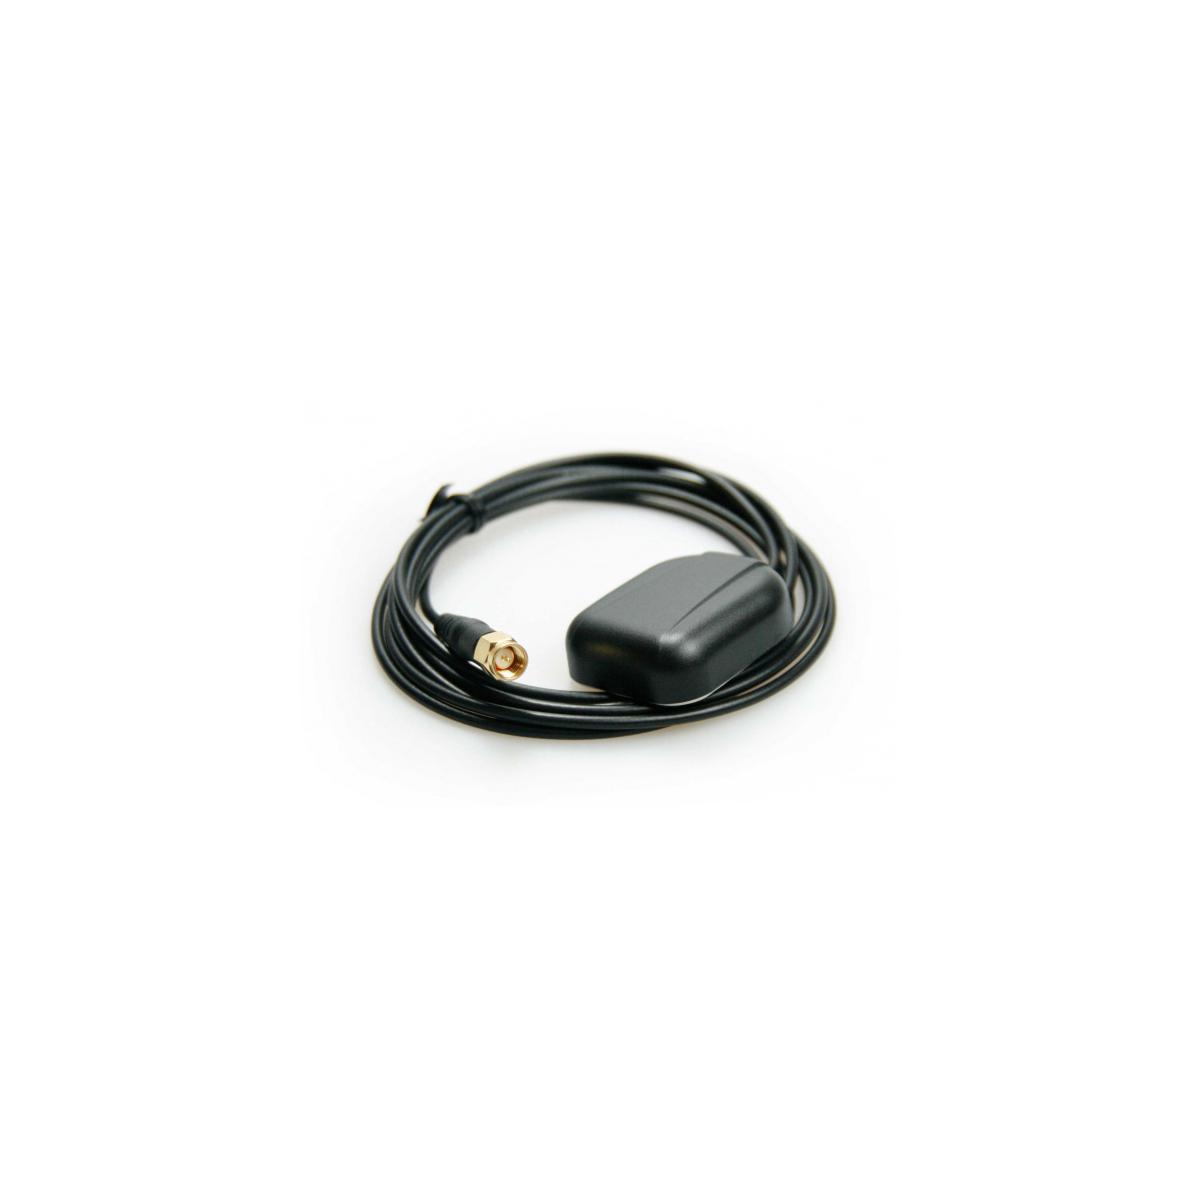 ampire gps antenne mit sma stecker 500cm 29 00. Black Bedroom Furniture Sets. Home Design Ideas